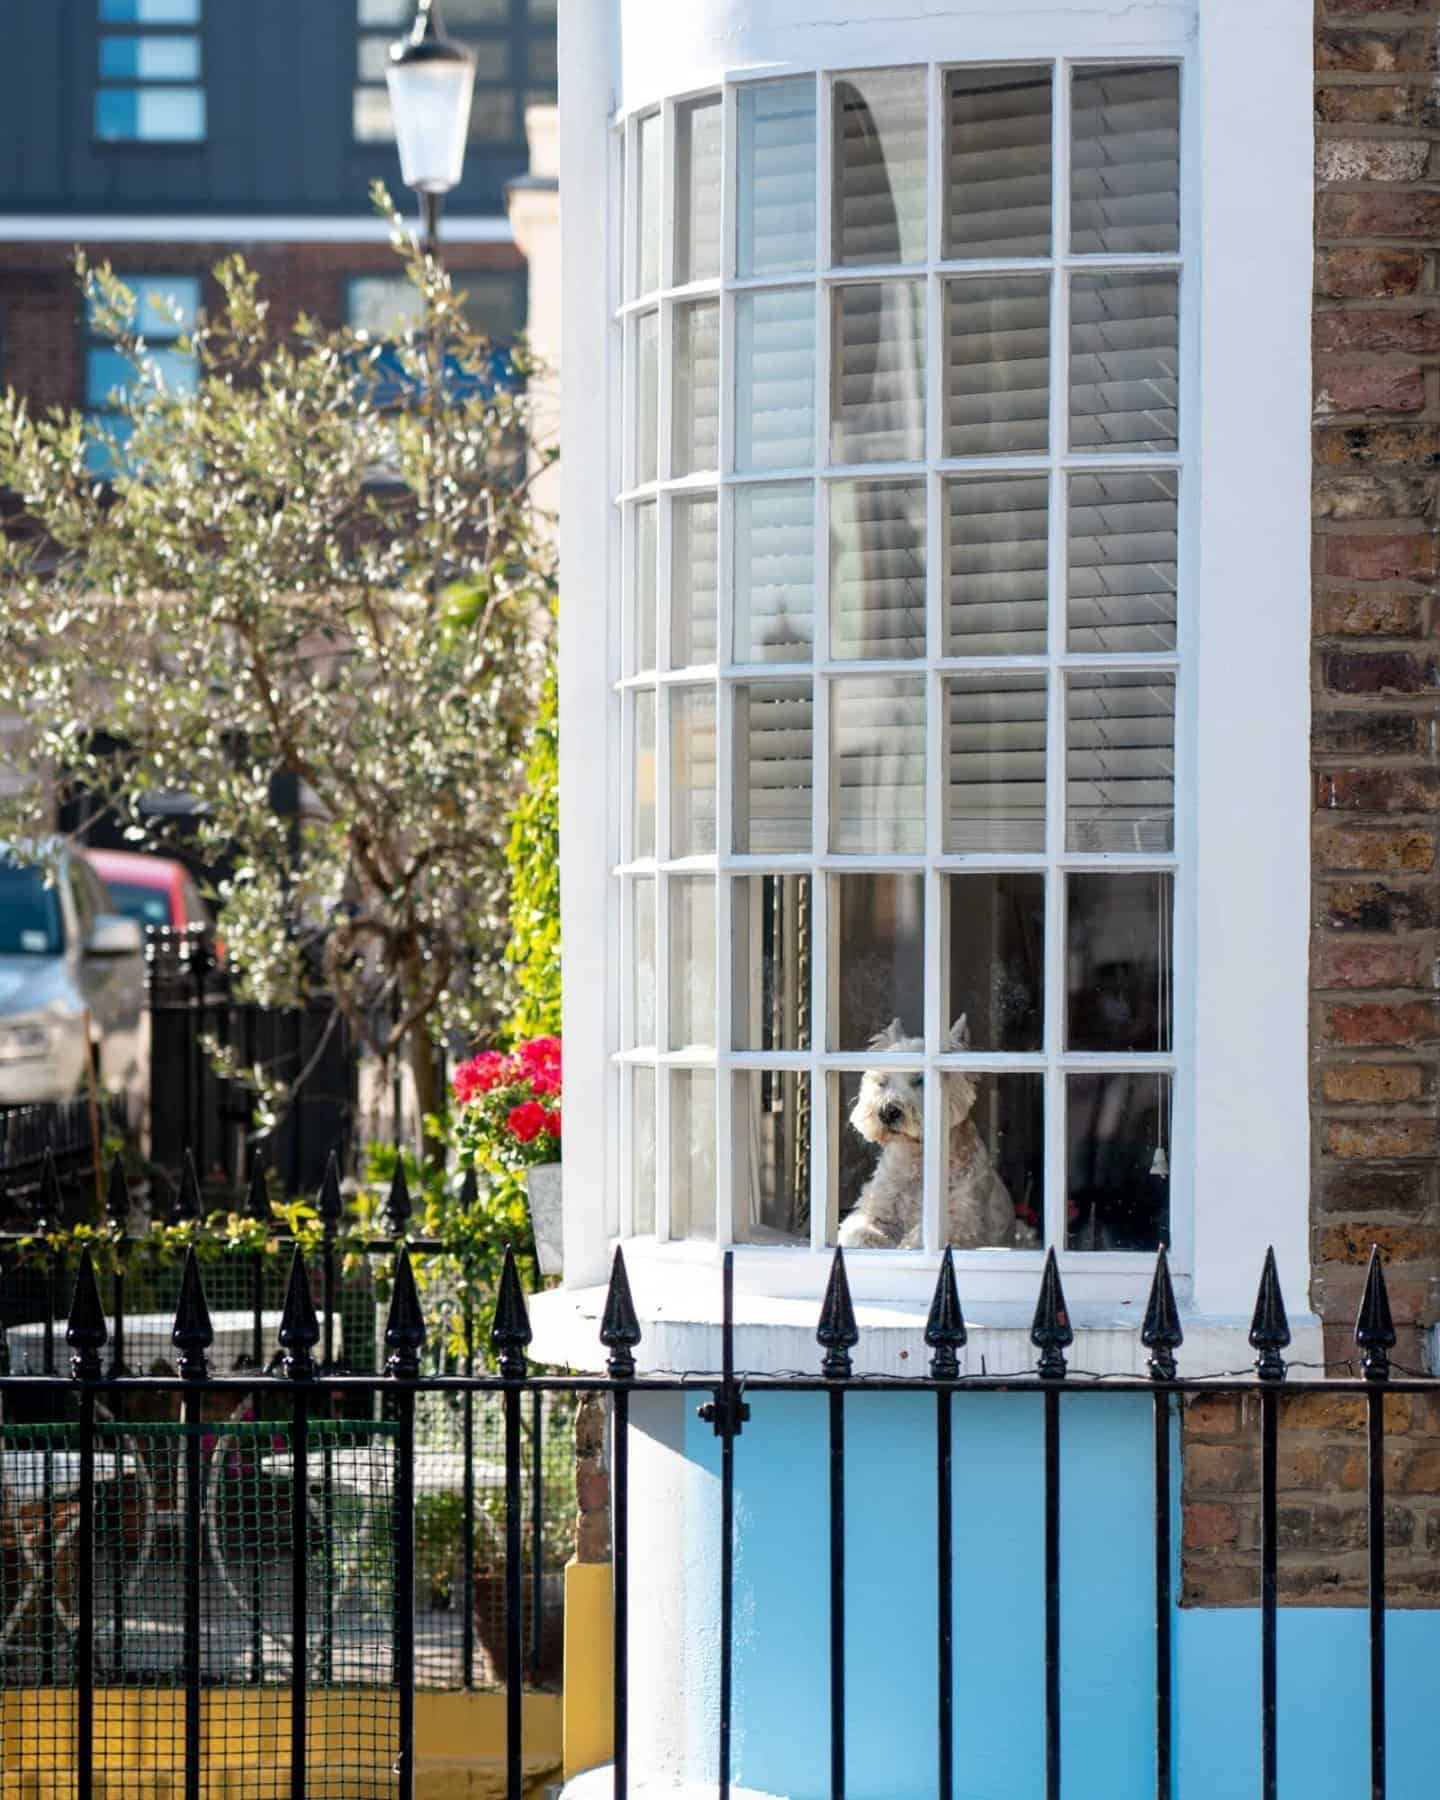 Notting hill cute dog in a window